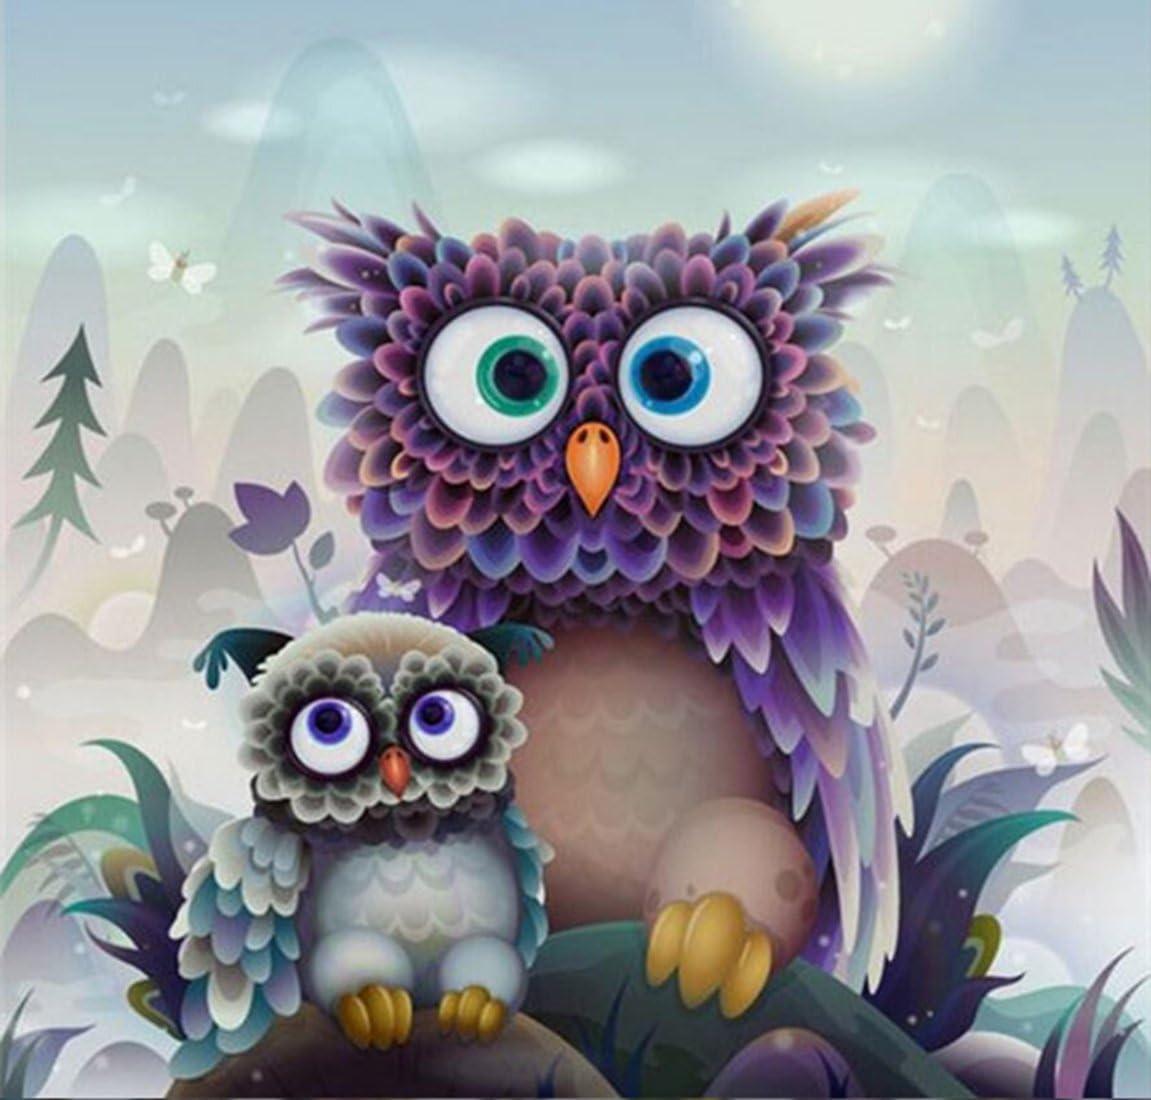 5D DIY Diamond Painting Diamante Painting by Number Kit Harry Potter Owl para Adultos Rhinestone Bordado Diamante Decoraci/ón Regalo de Vacaciones 30x40cm Sin marco